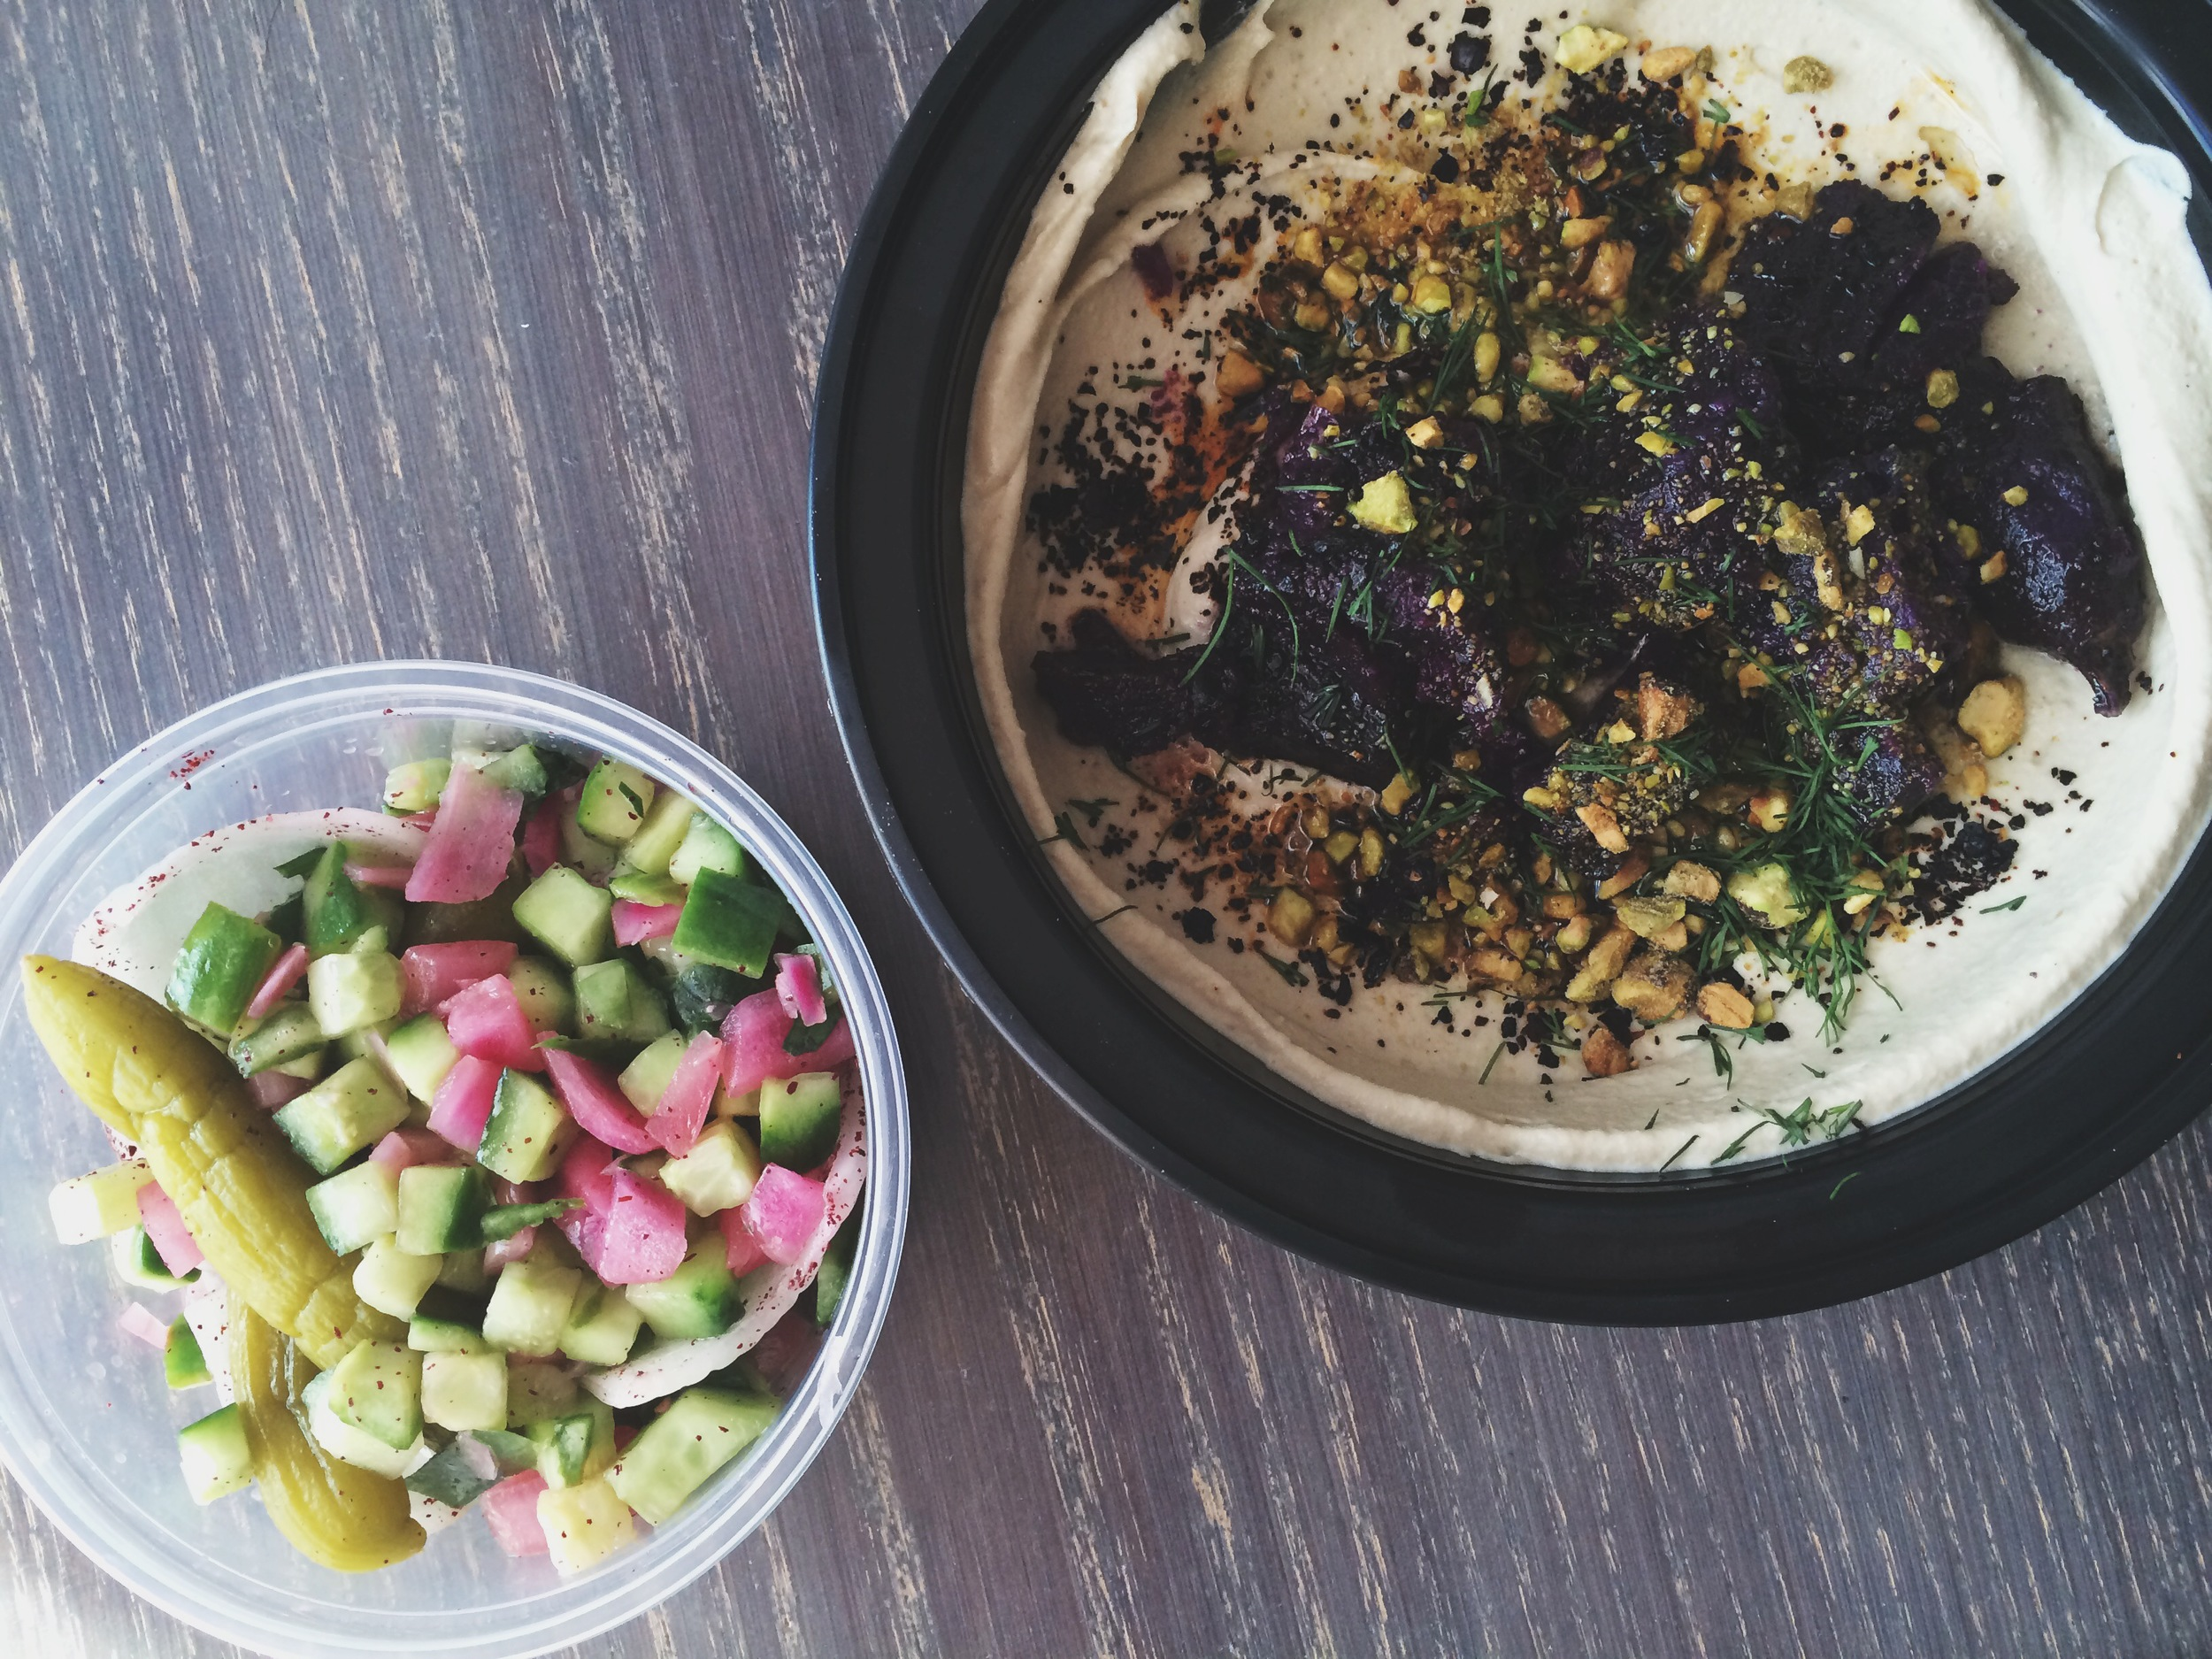 Purple Yam Hummus from Dizenoff on Sansom Street. THEEE BOMB DOT COM